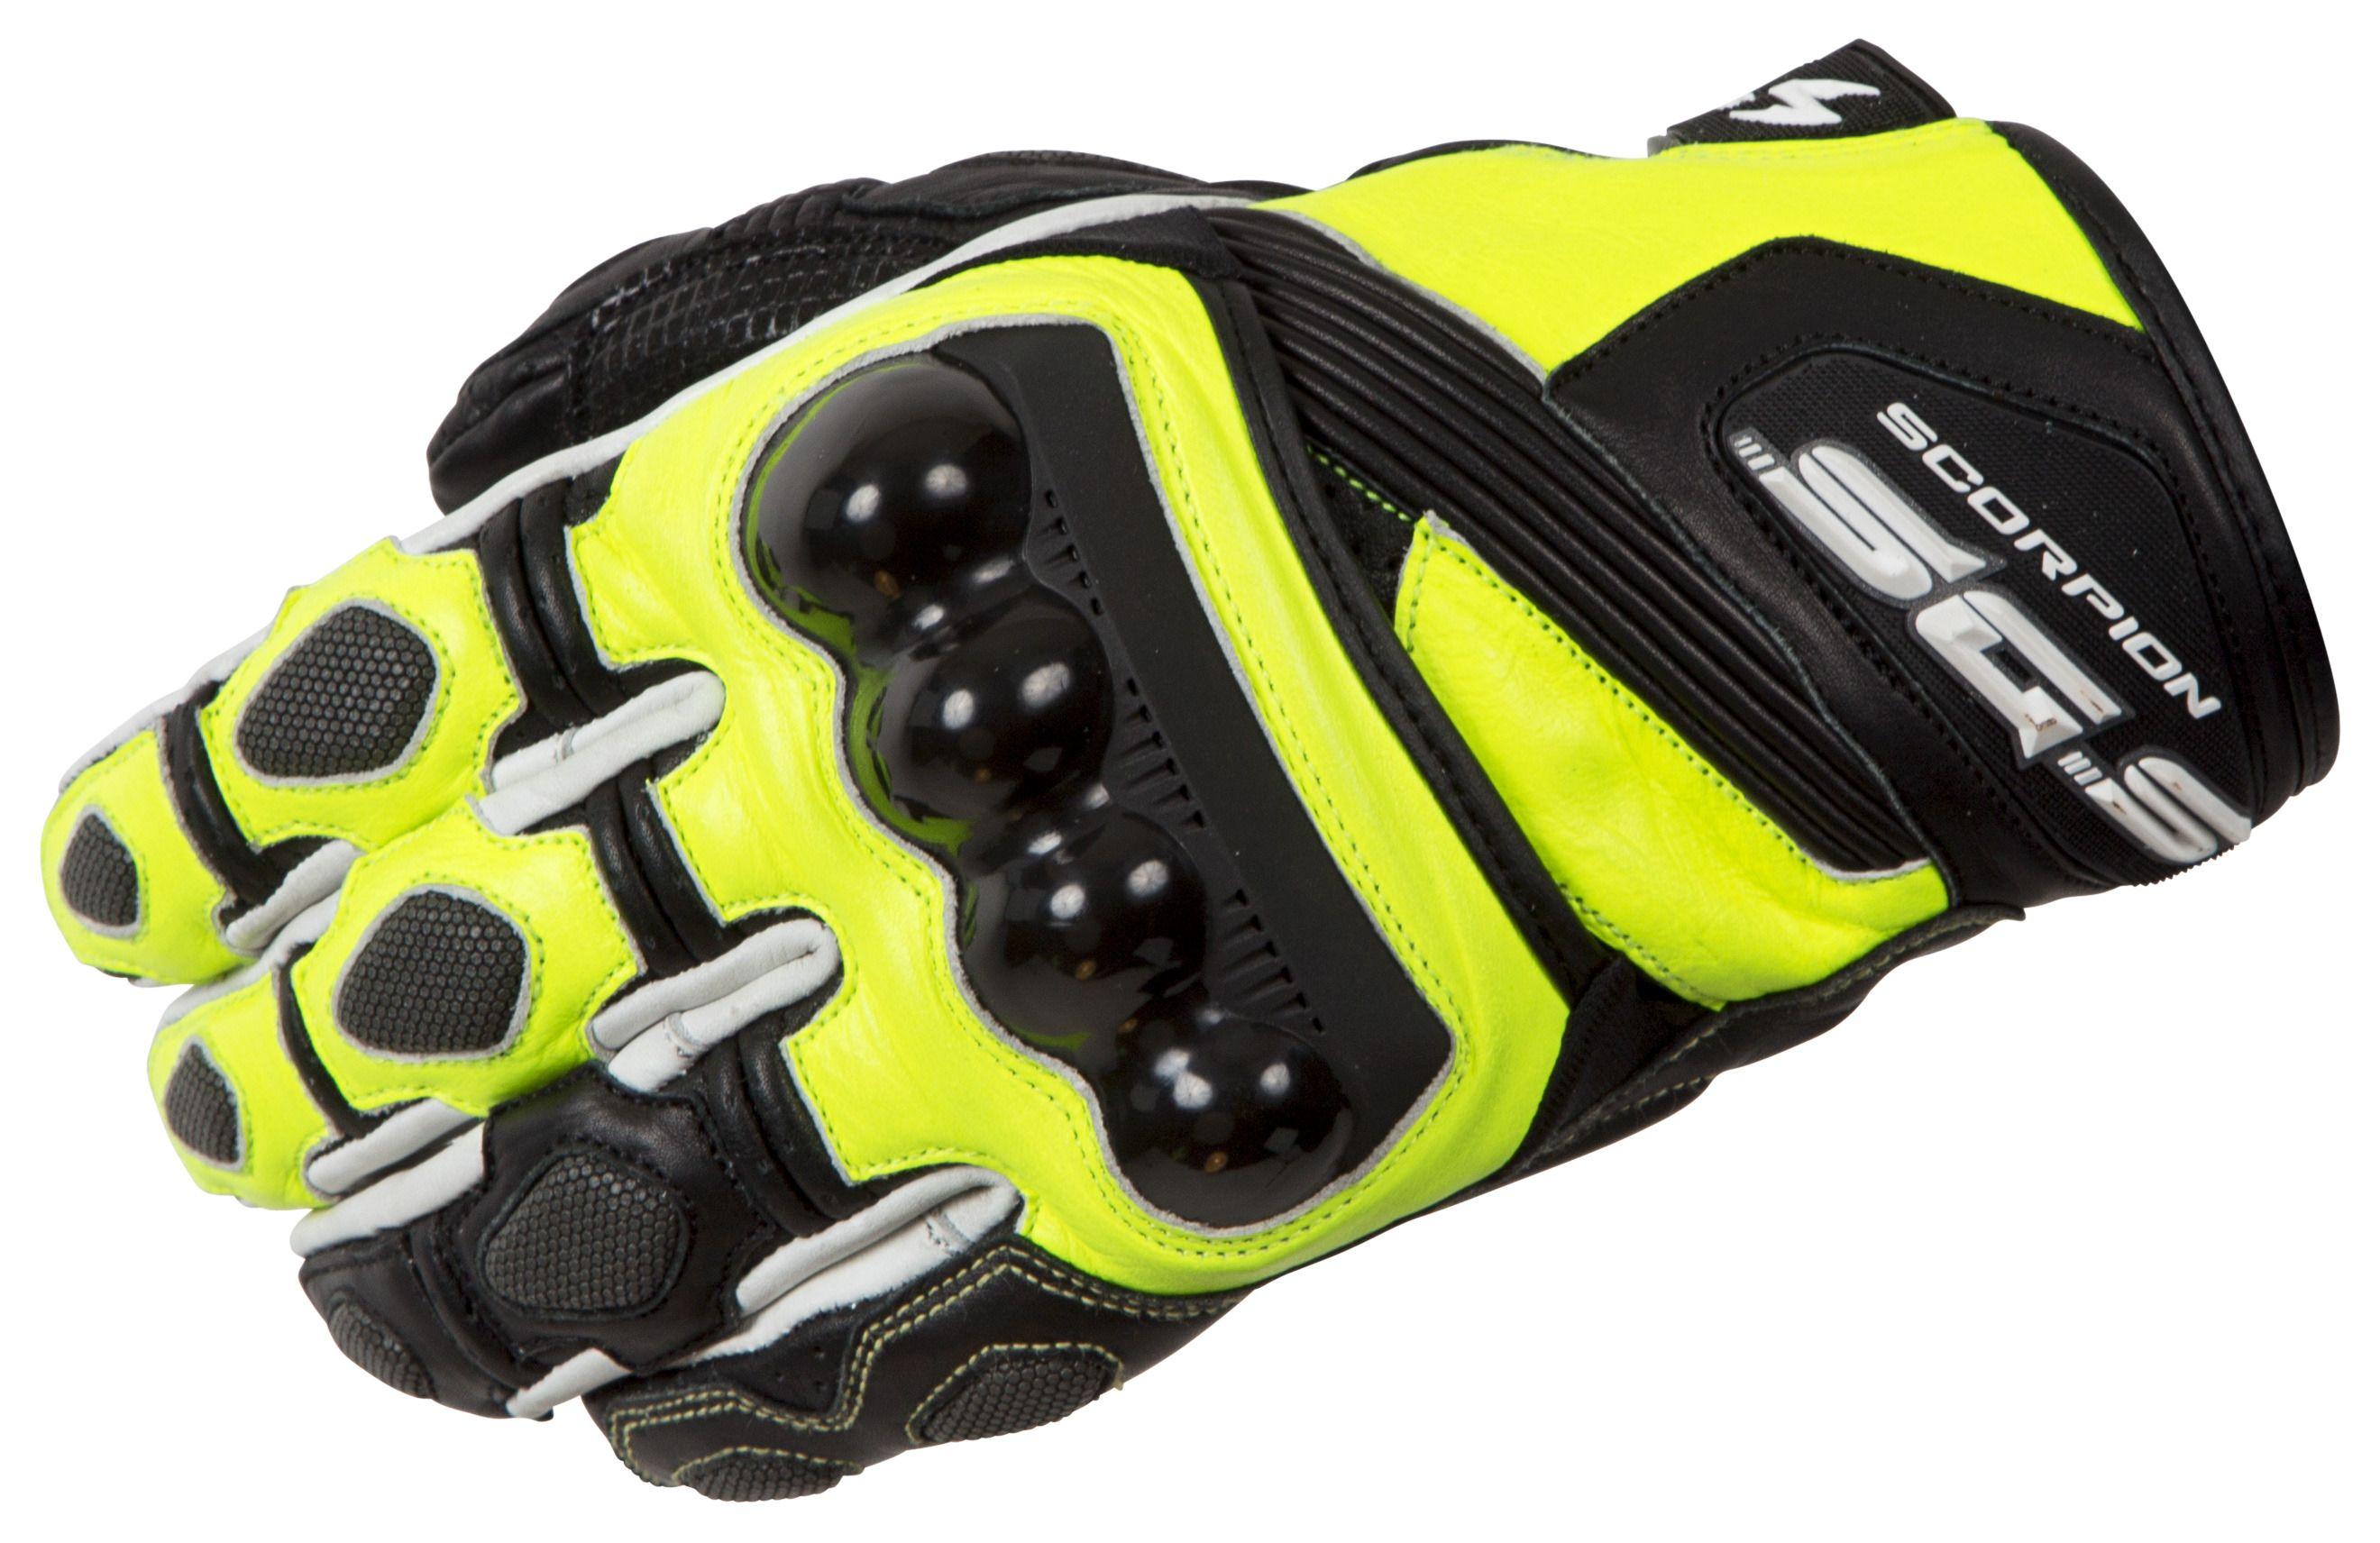 Motorcycle gloves ottawa - Motorcycle Gloves Ottawa 59